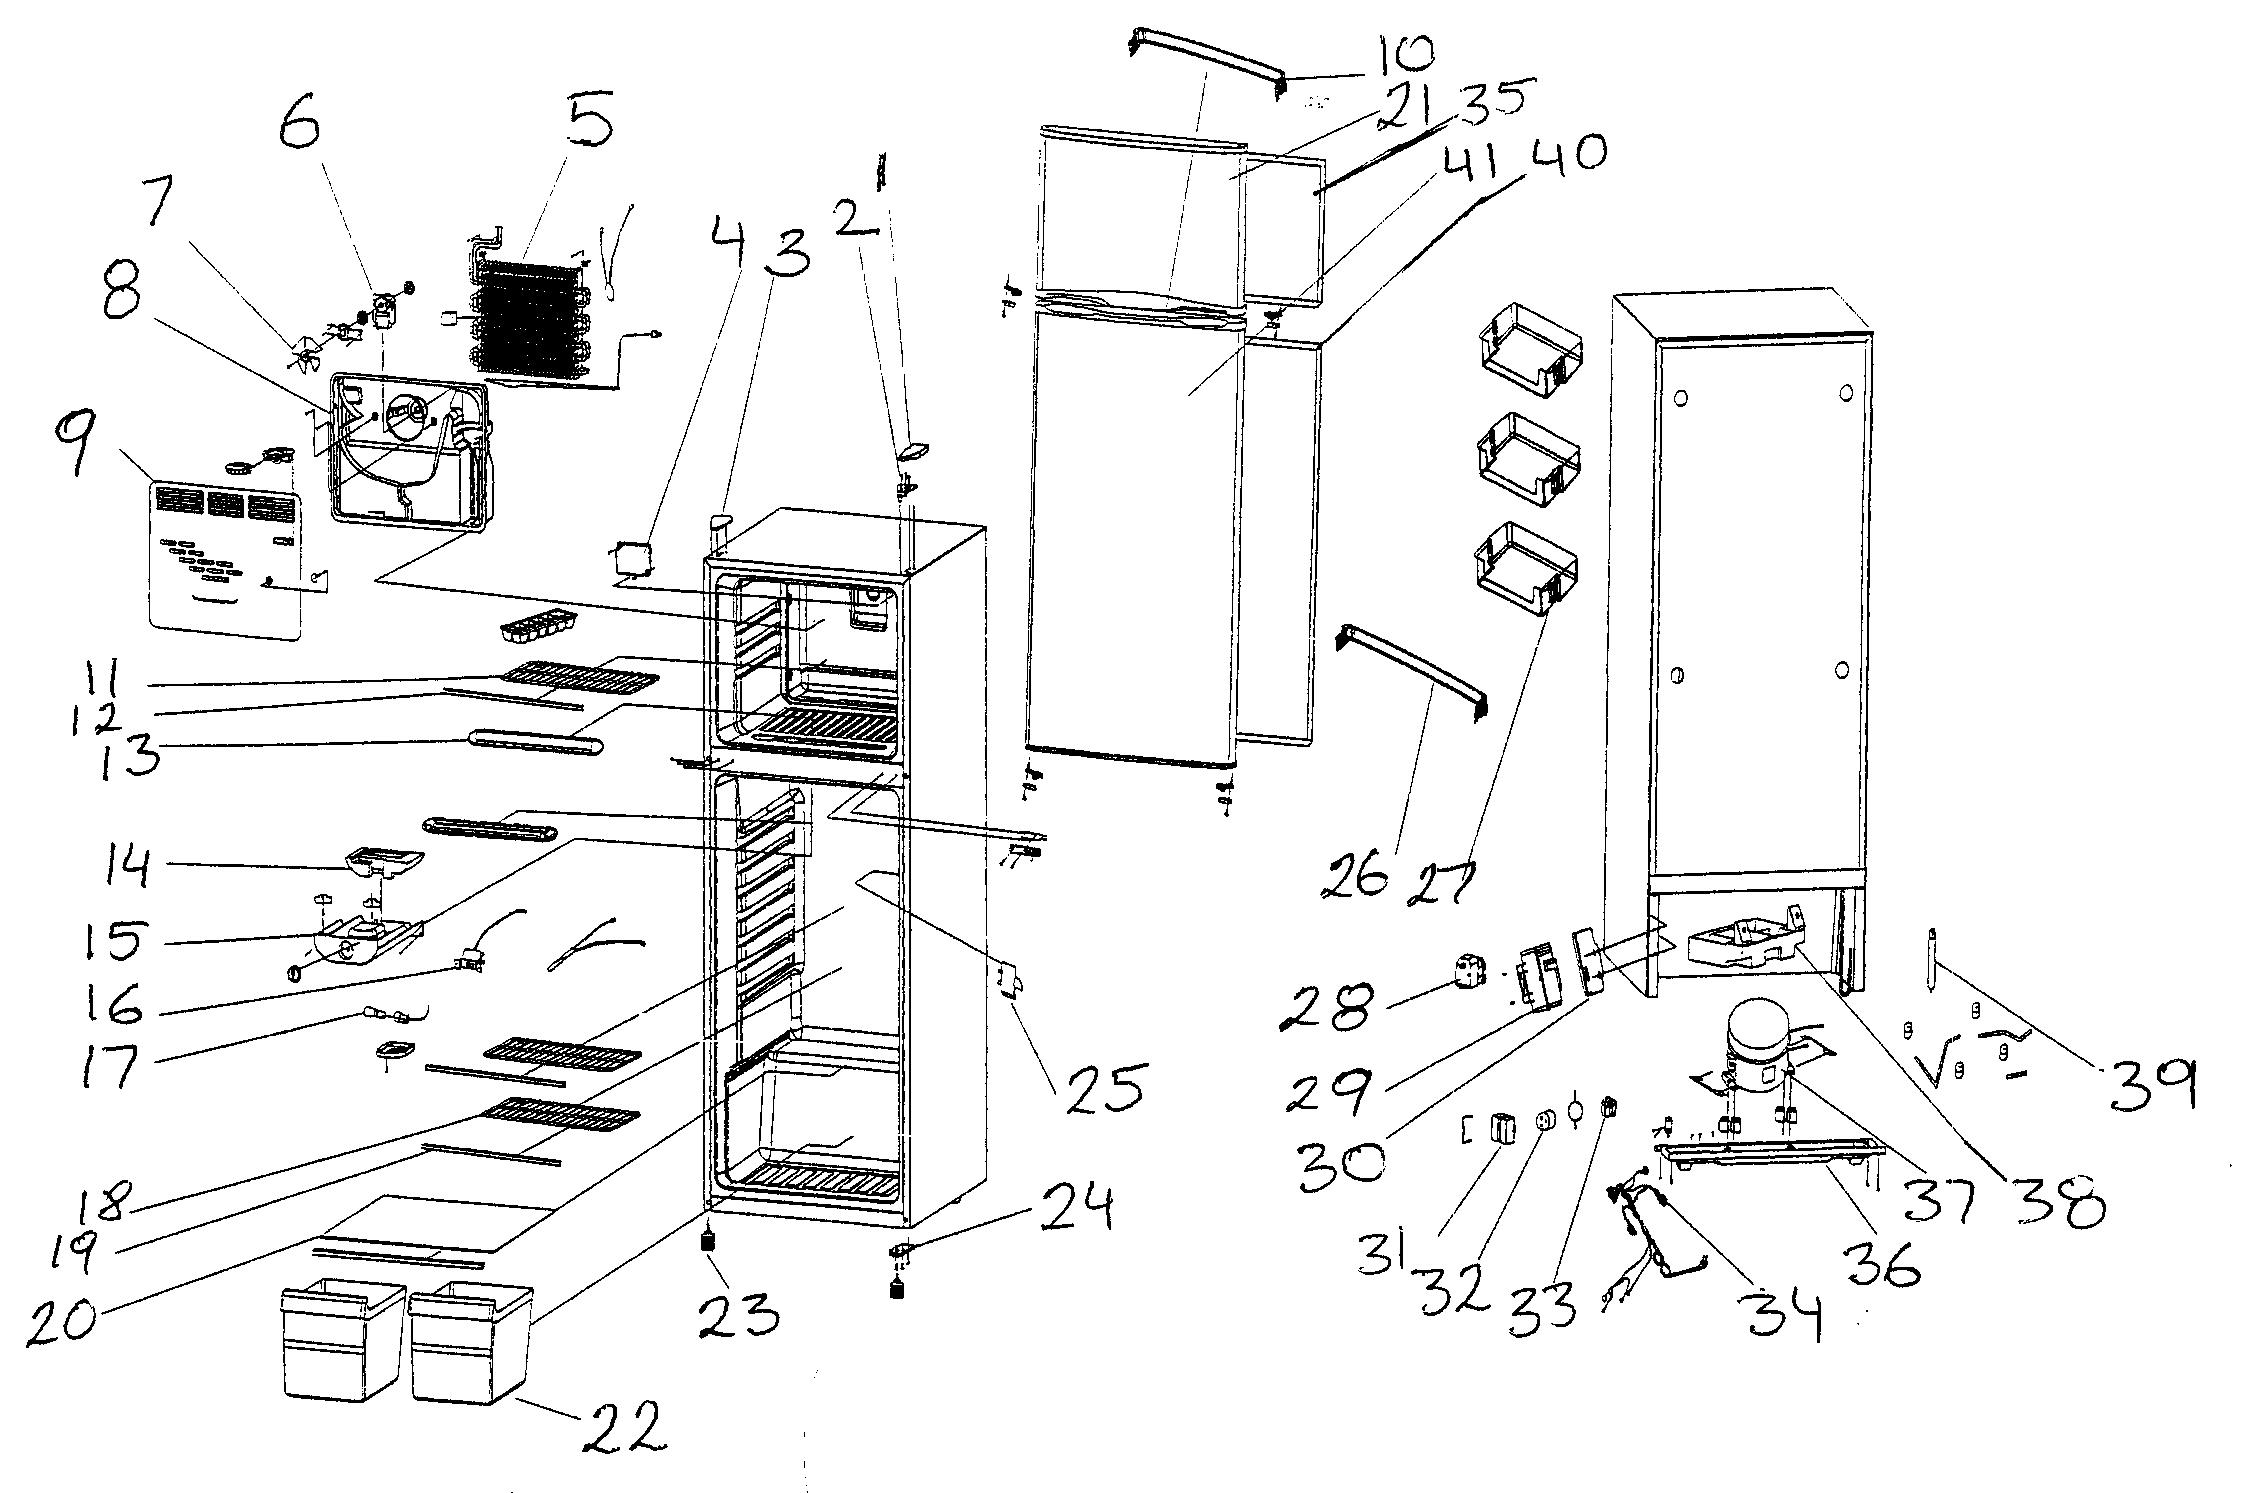 Refrigerator Diagram Amp Parts List For Model Mcbr W